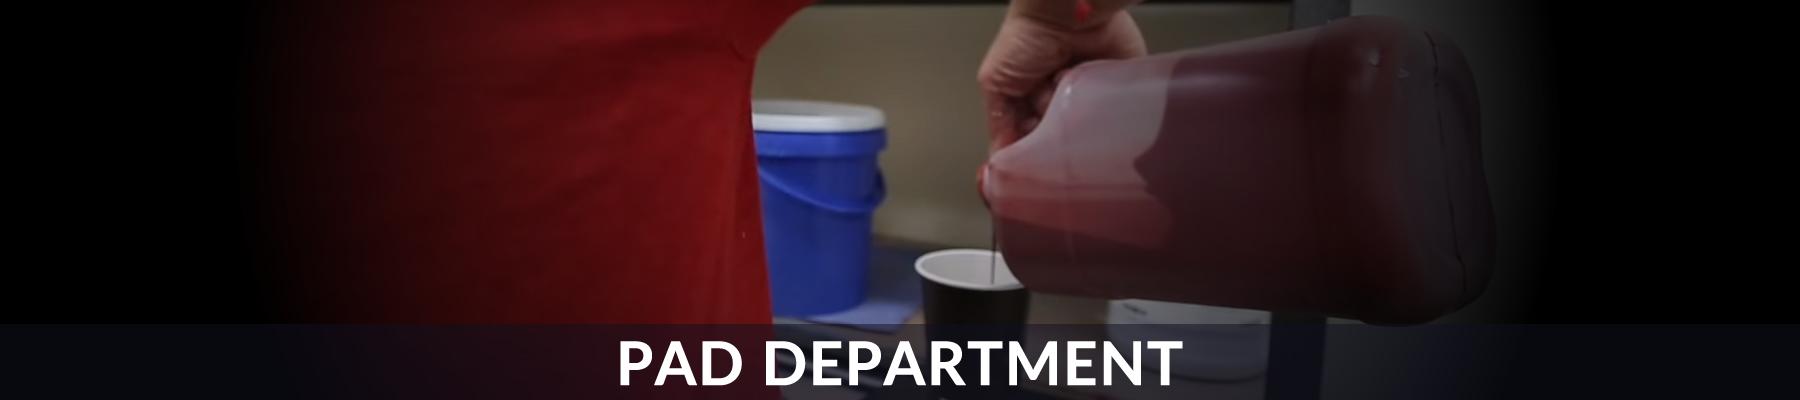 Pad Department 2